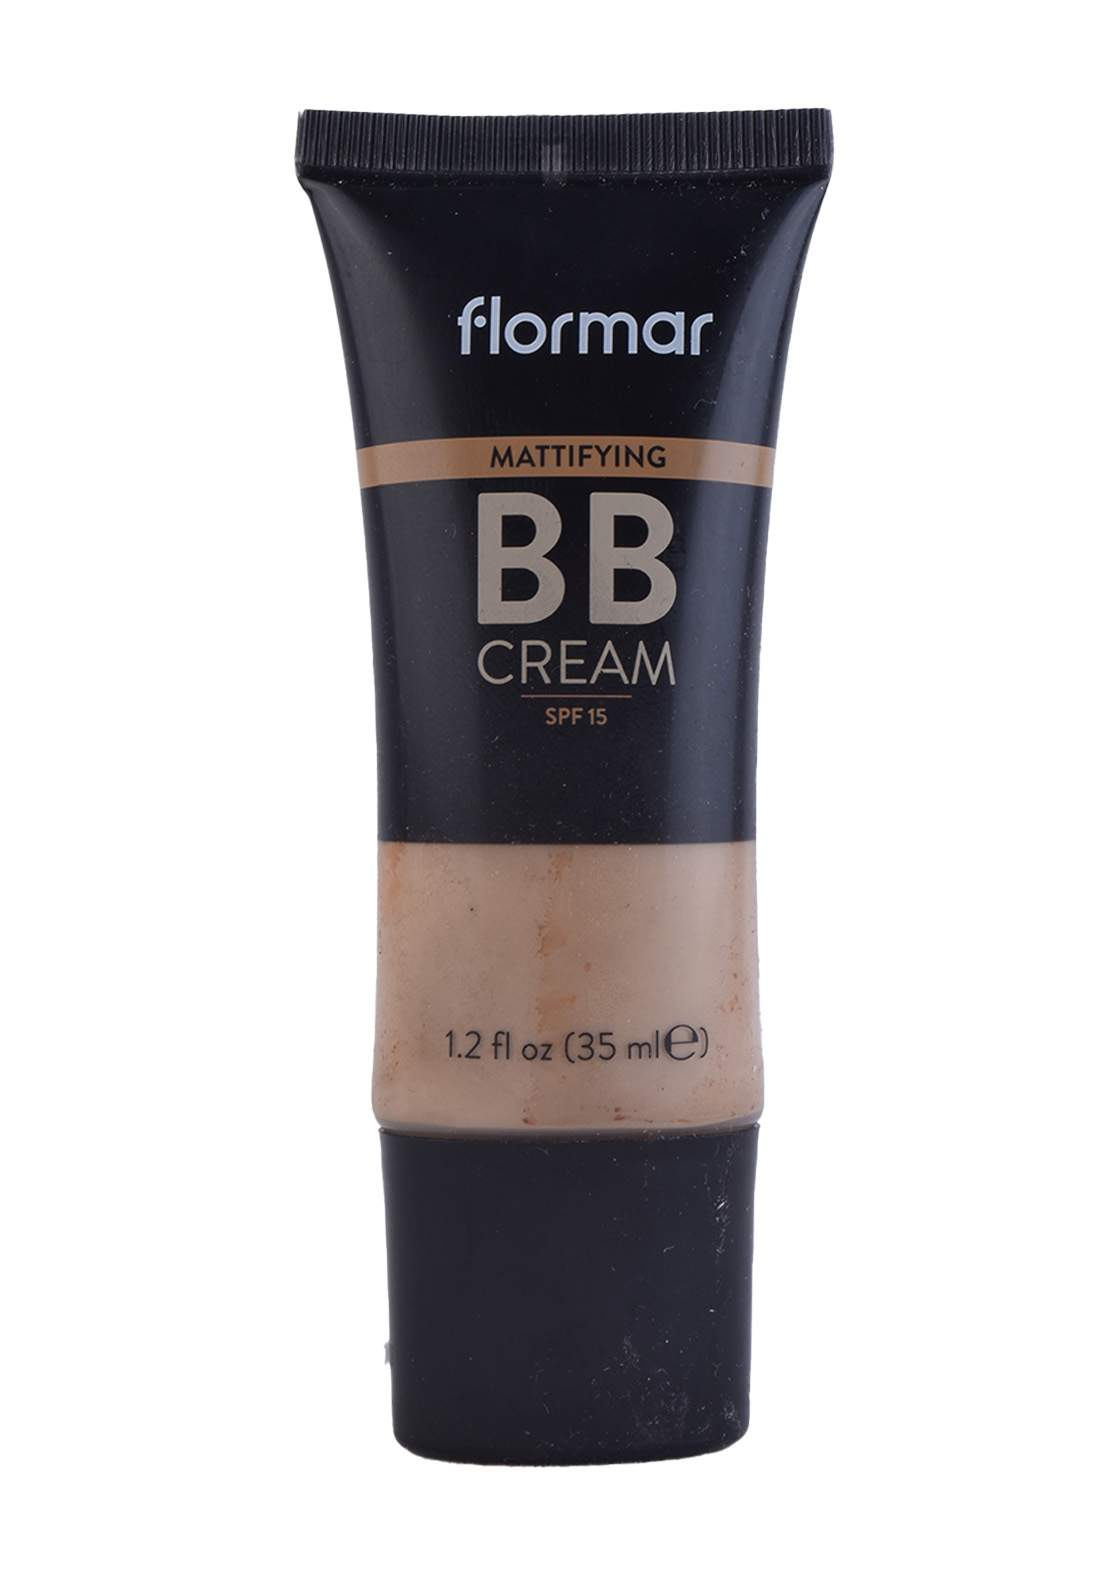 Flormar BB Cream SPF 15 Fair\Light 35ml بي بي كريم